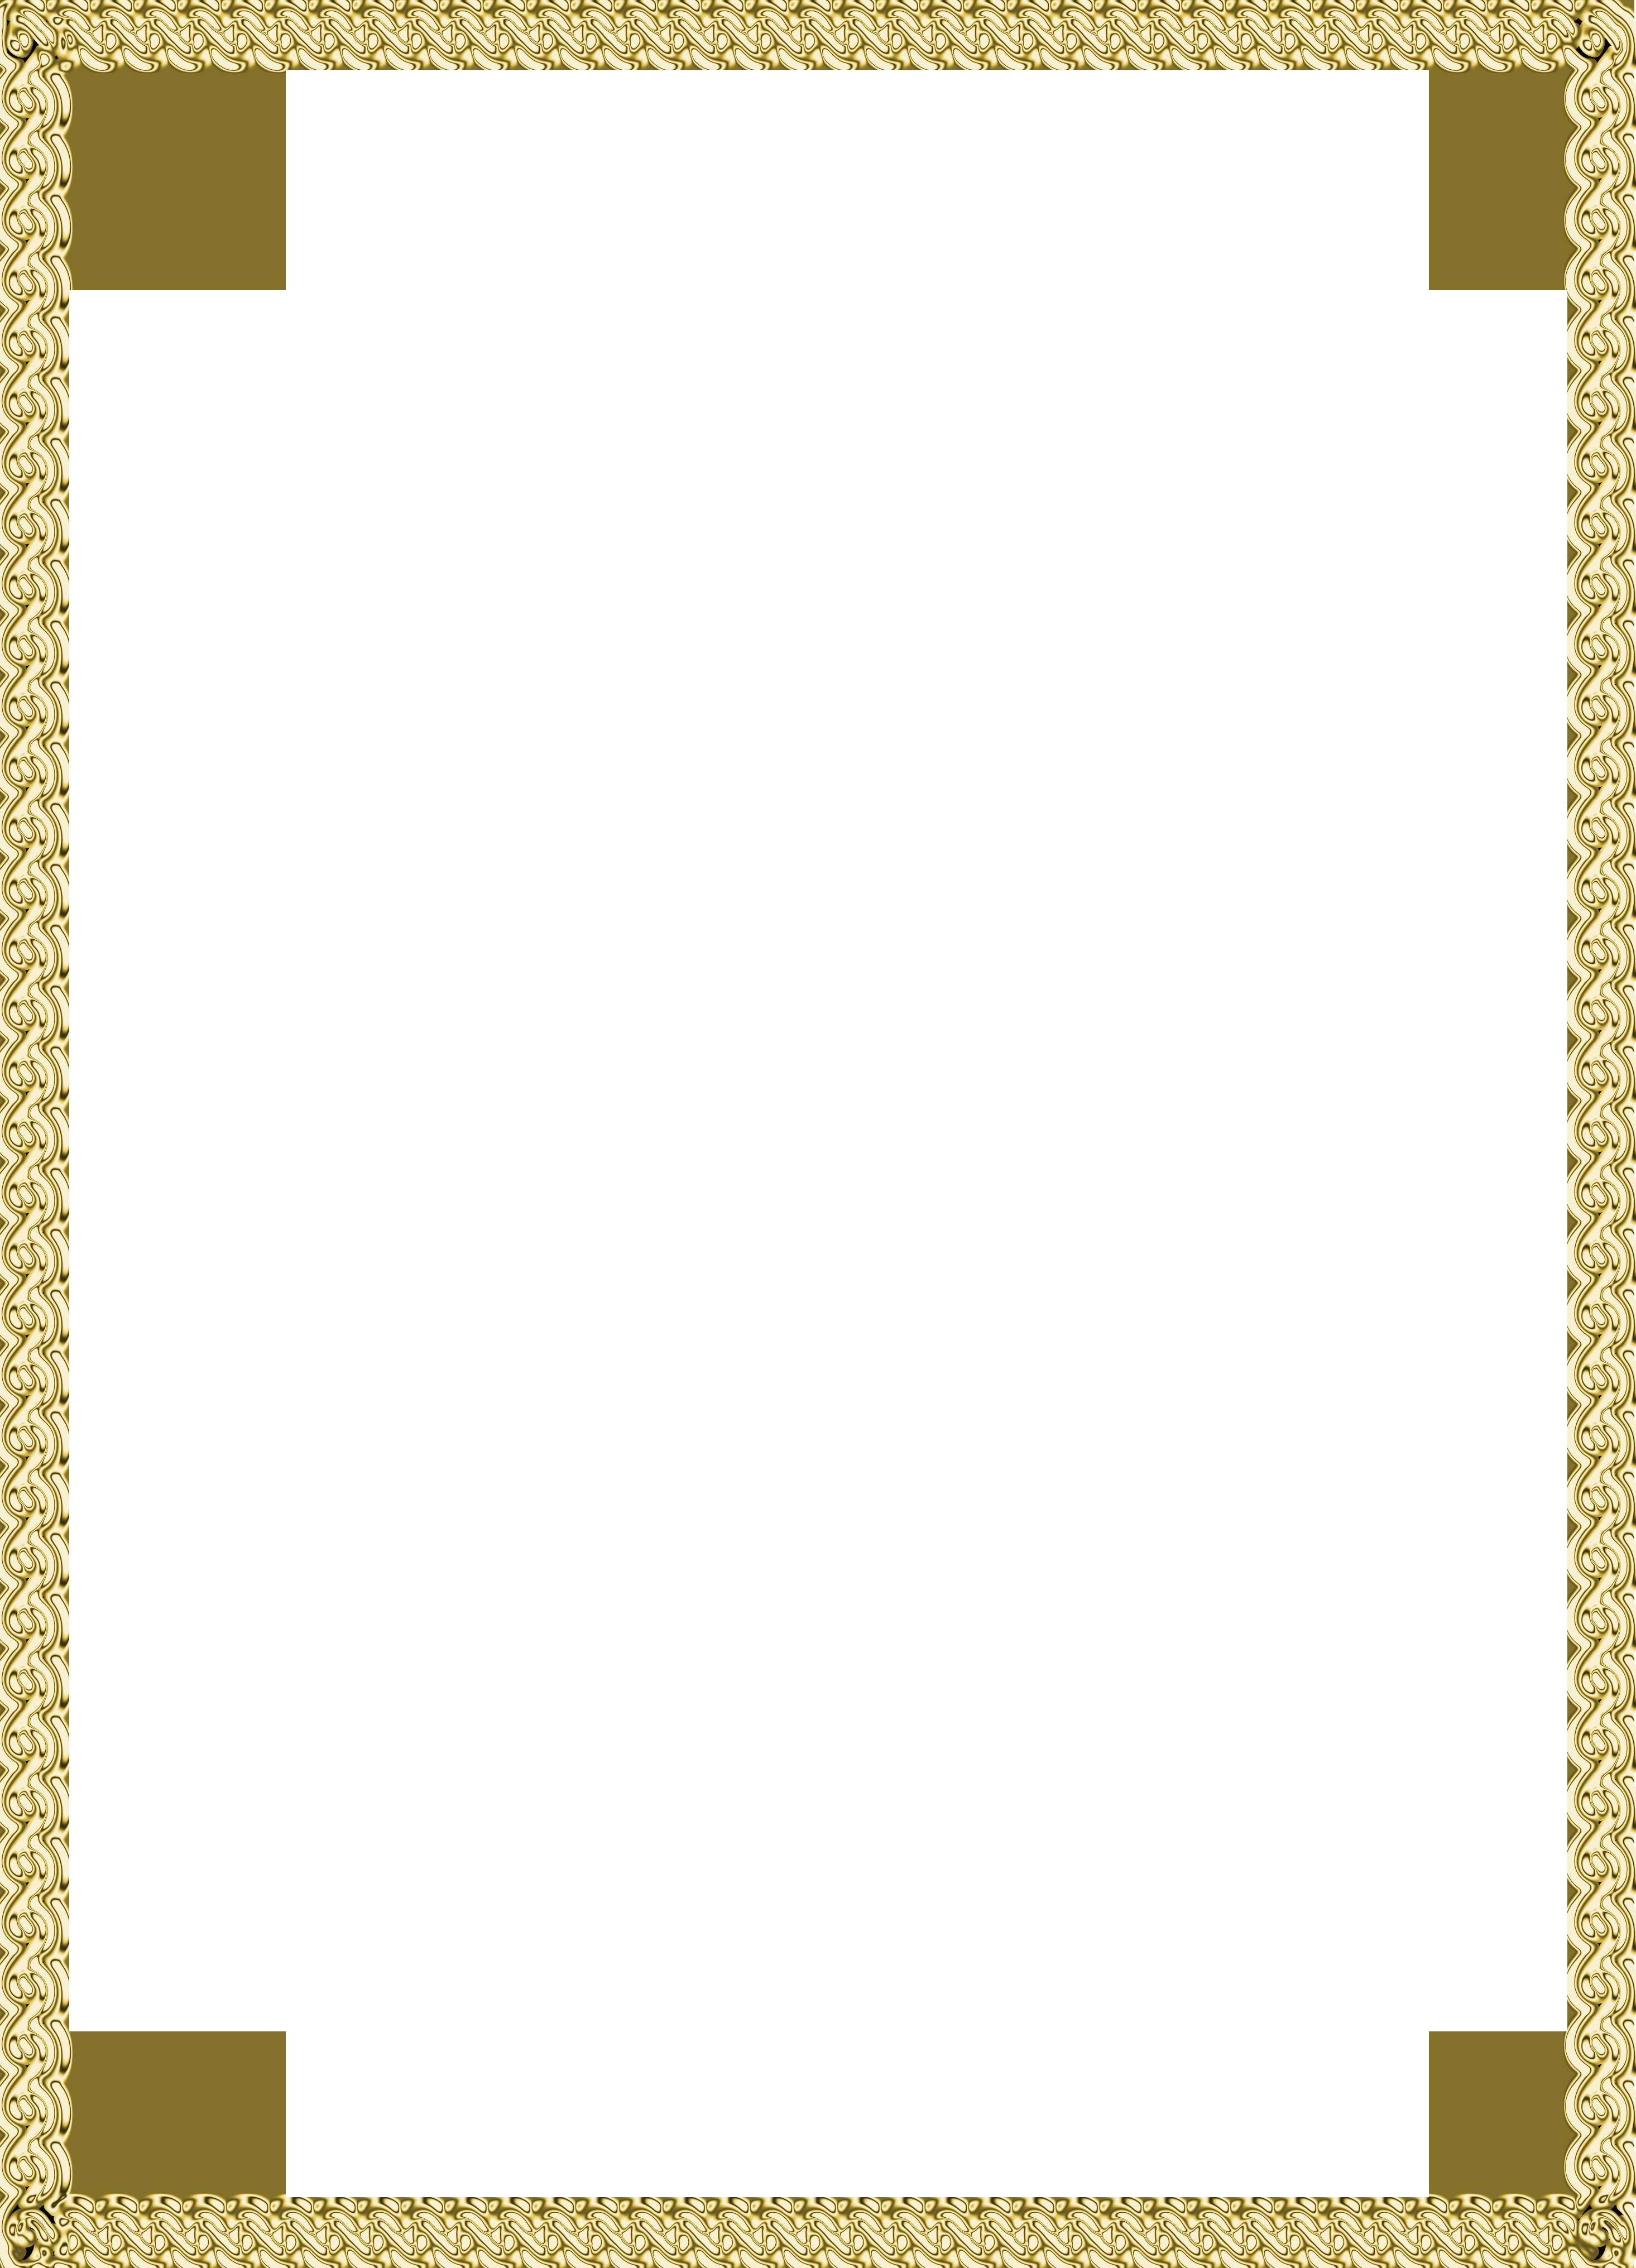 рамки для текста картинка